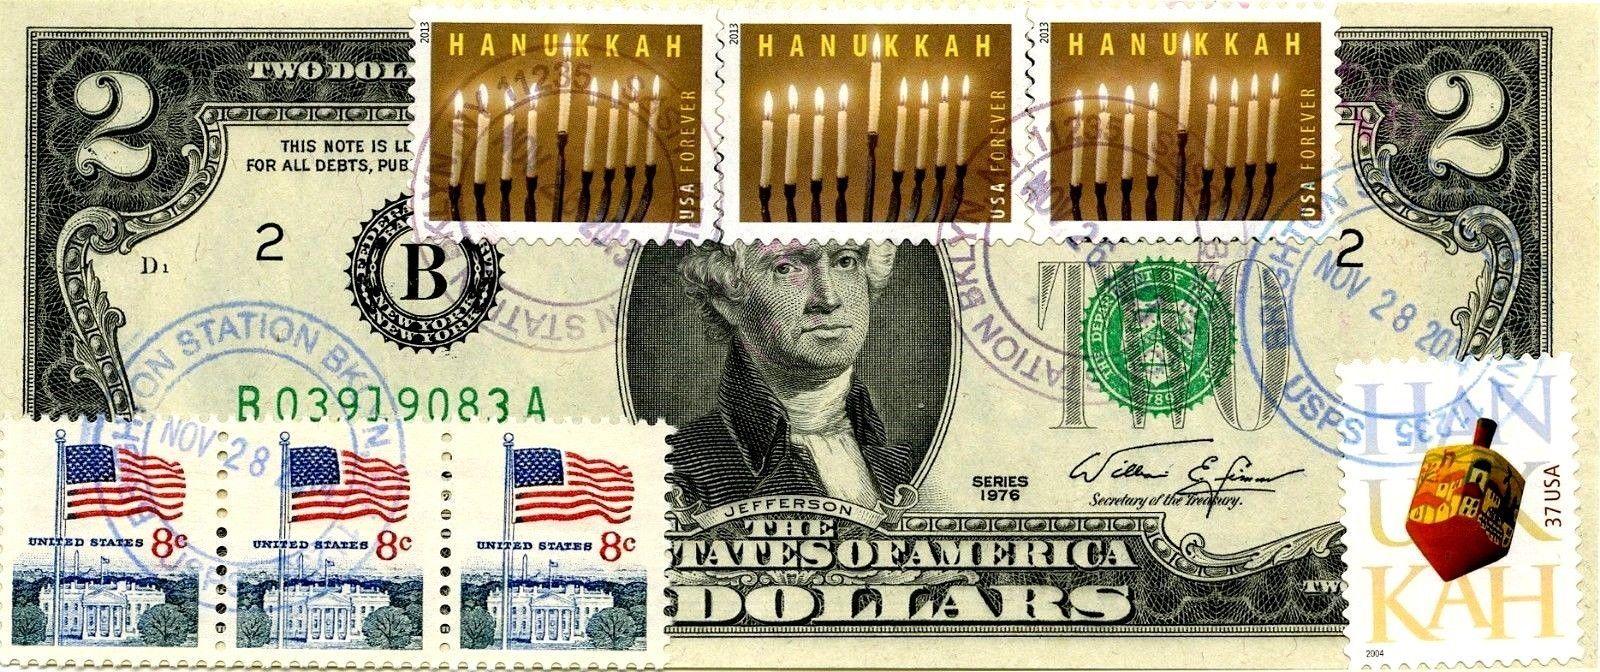 MONEY US $2 DOLLARS 1976 NEW YORK  FIRST DAY STAMP CANCEL & HANUKKAH GEM UNC